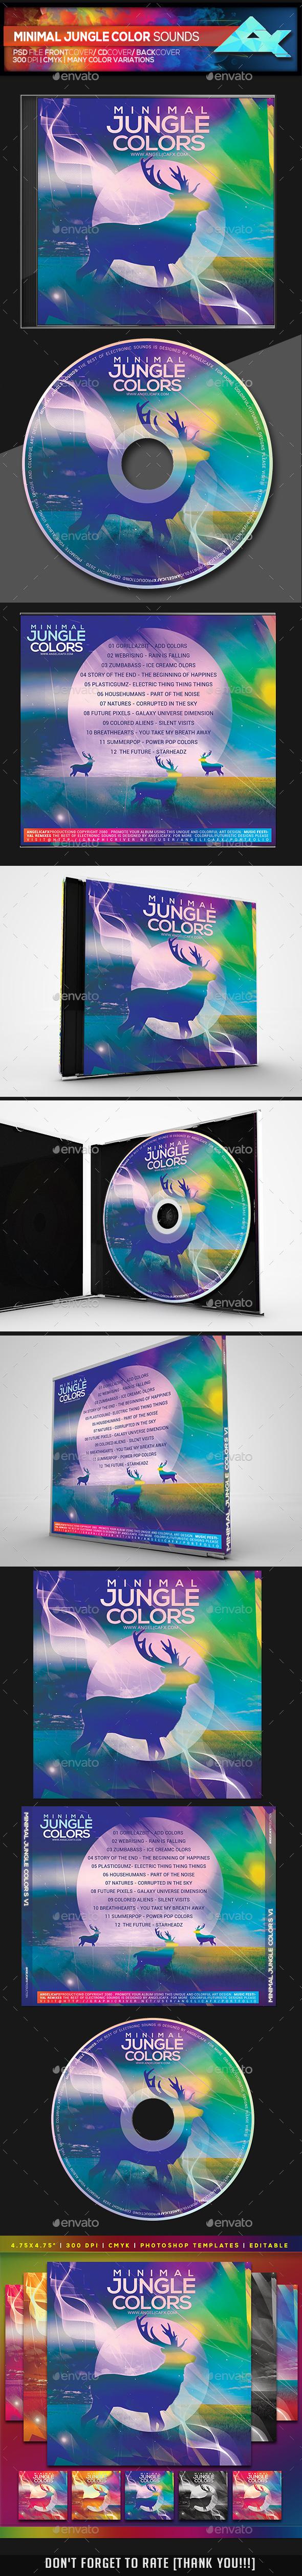 Minimal Jungle Color Sounds CD/DVD Photoshop Template - CD & DVD Artwork Print Templates